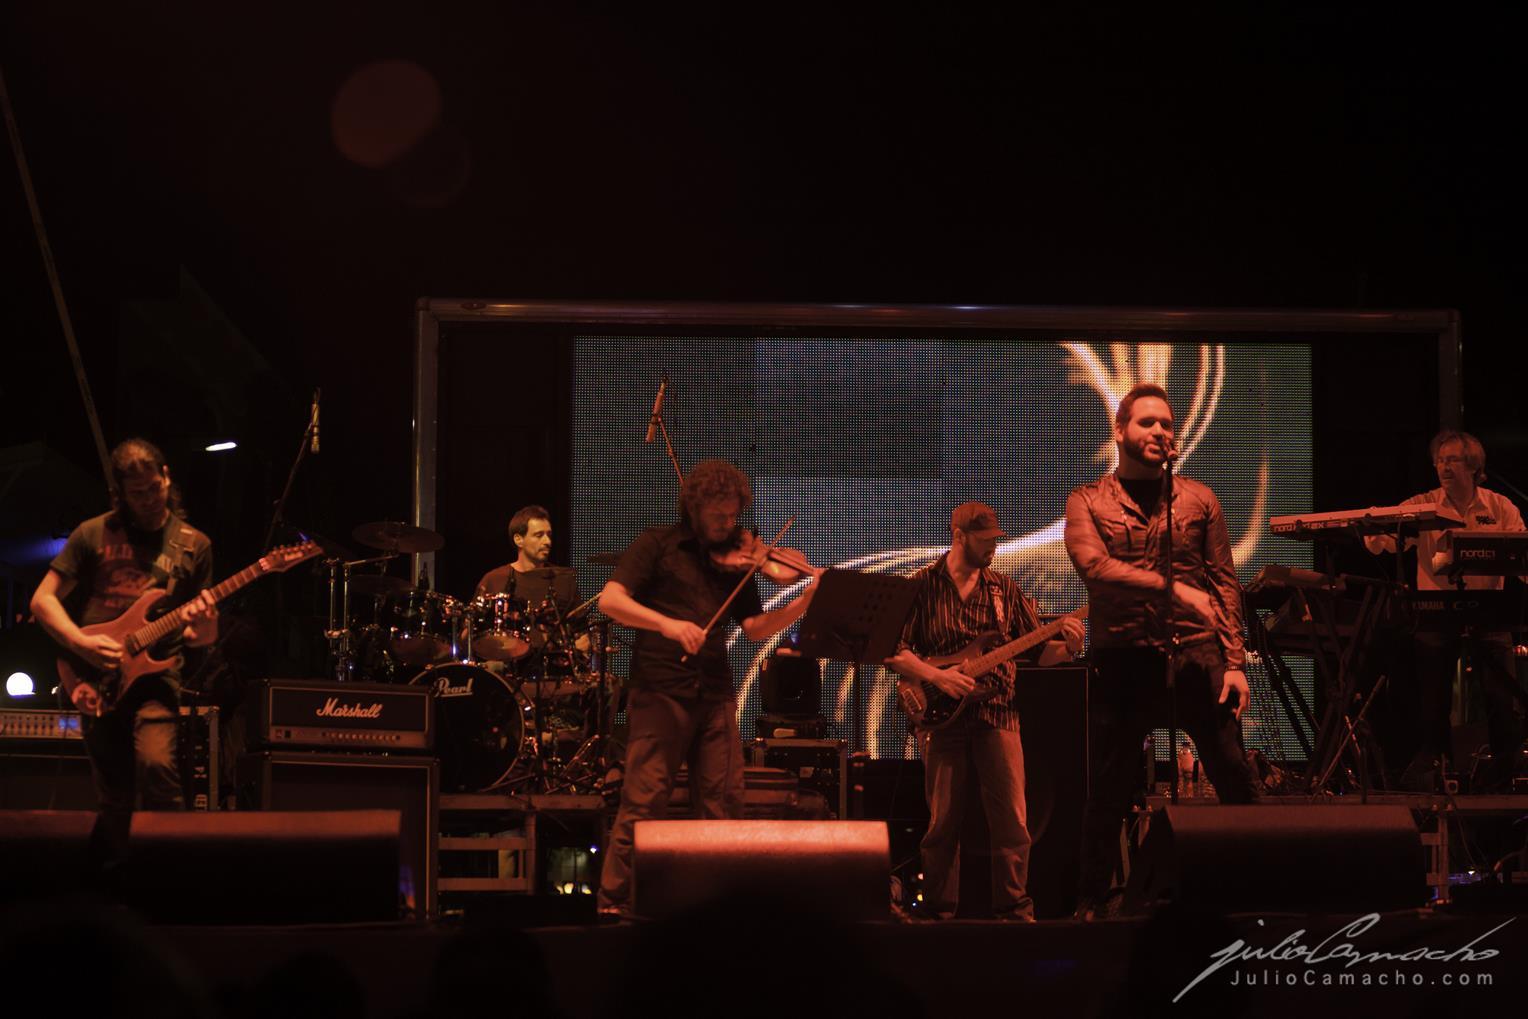 2014-10-30 31 CAST TOUR Ensenada y Tijuana - 1399 - www.Juli (Copy).jpg